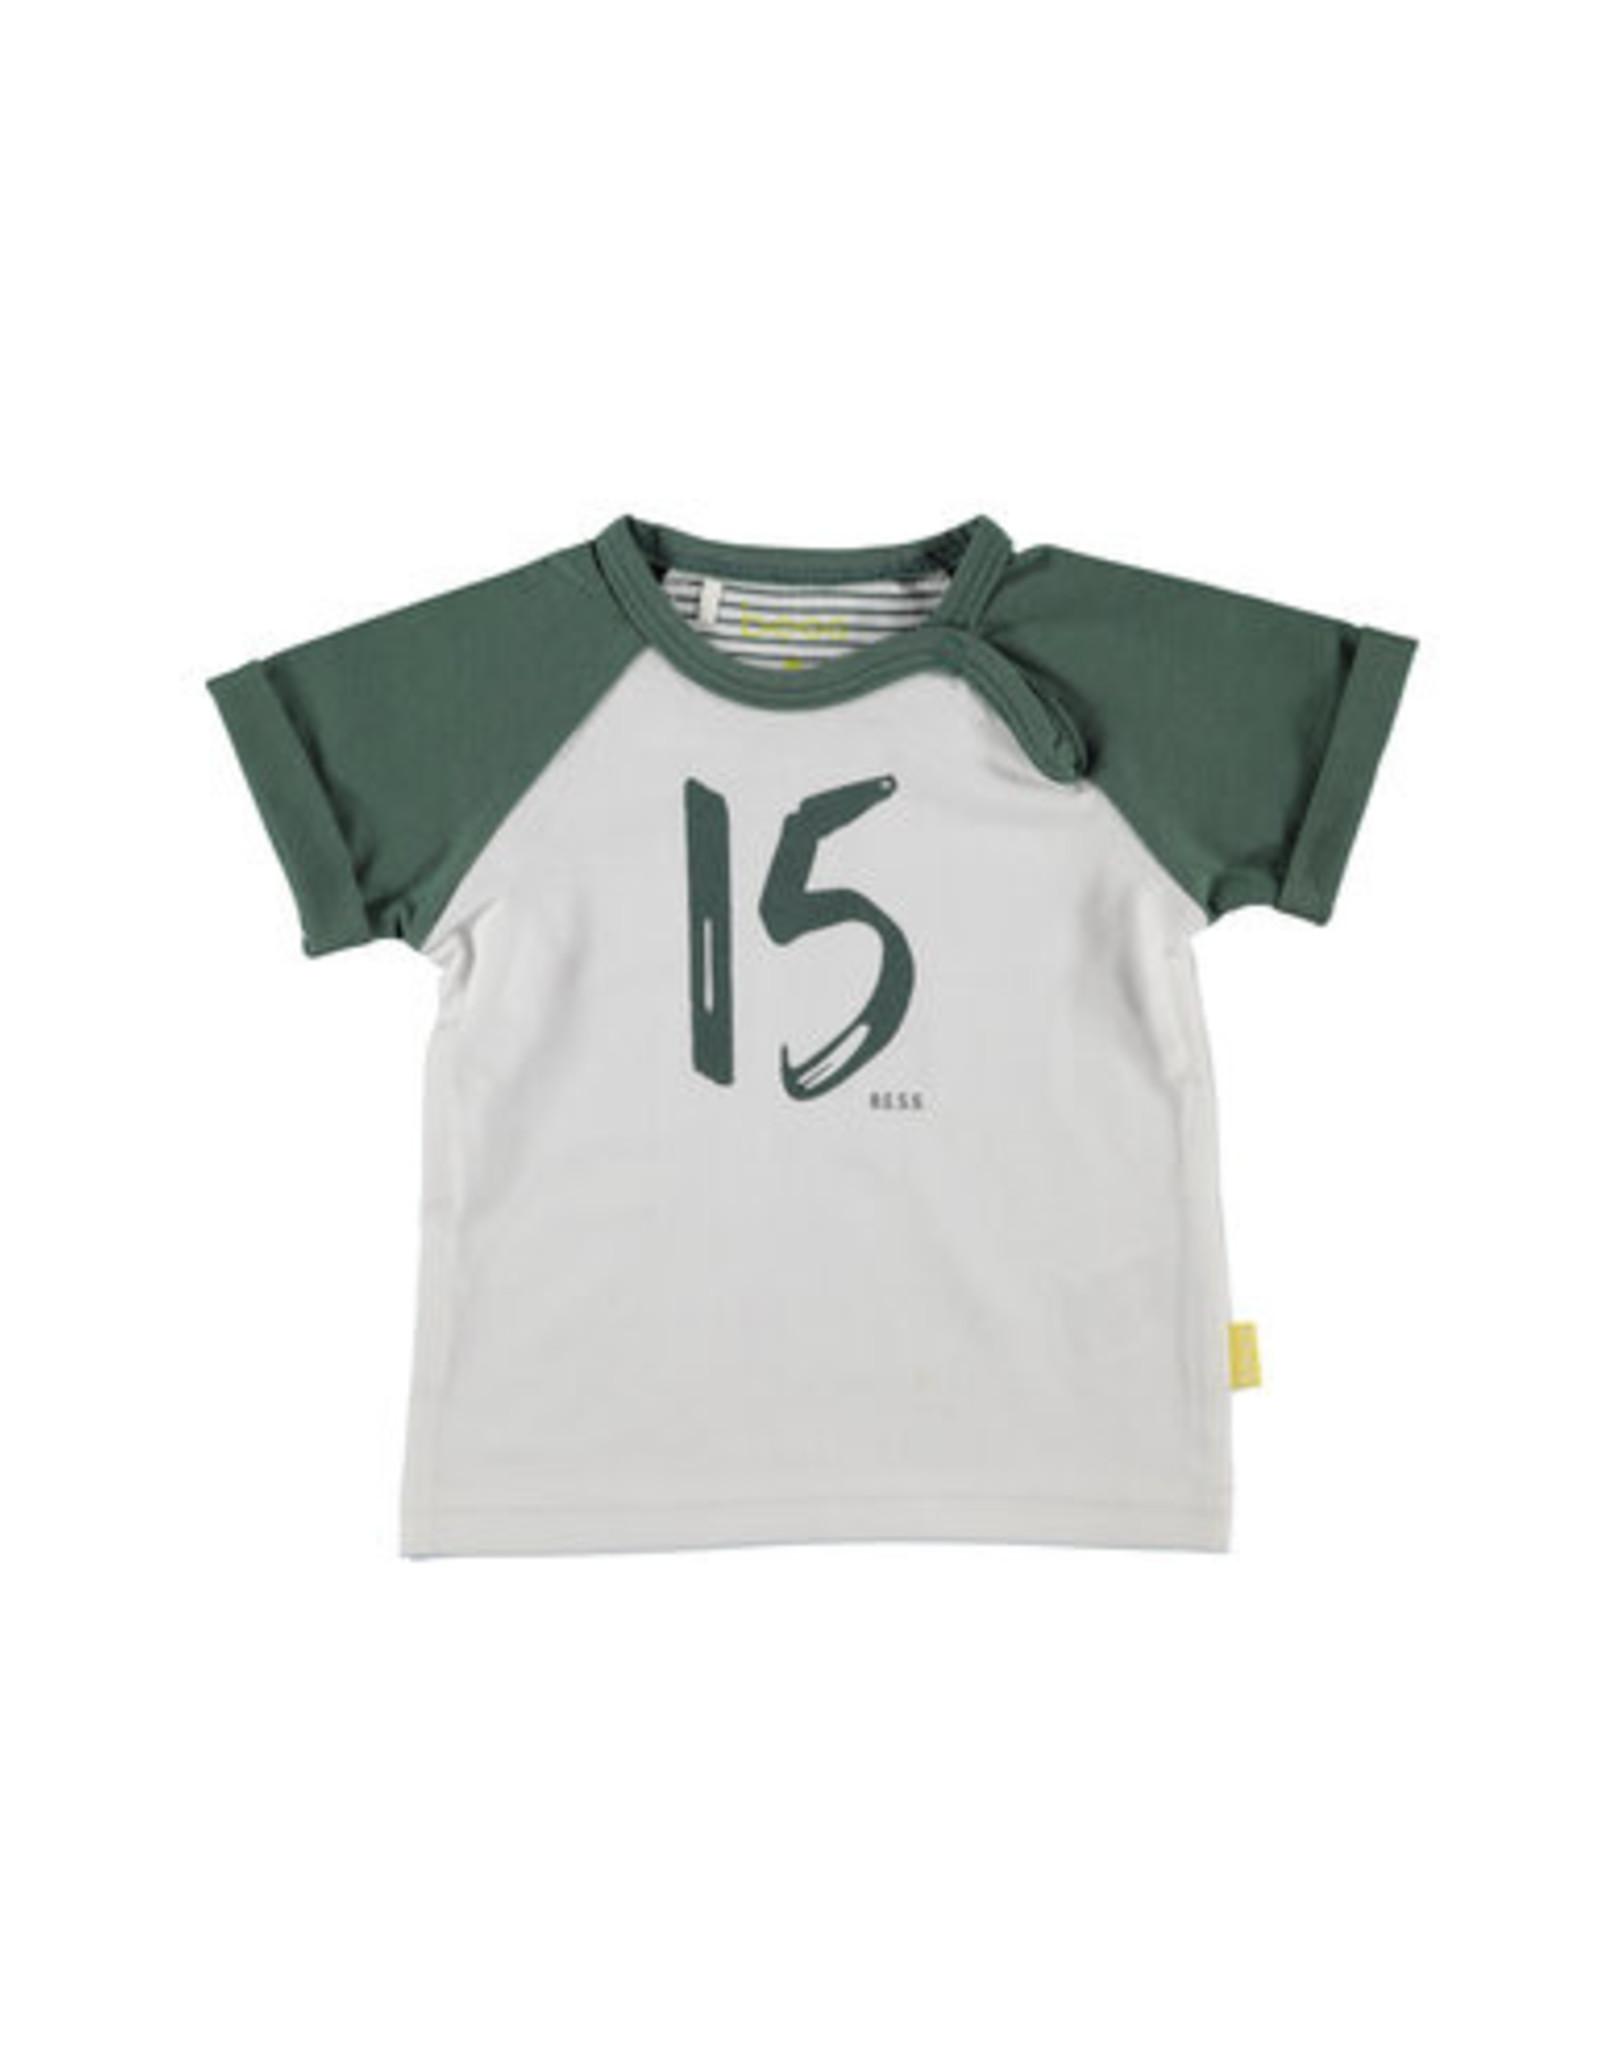 BESS Bess T-shirt White sh.sl. 15